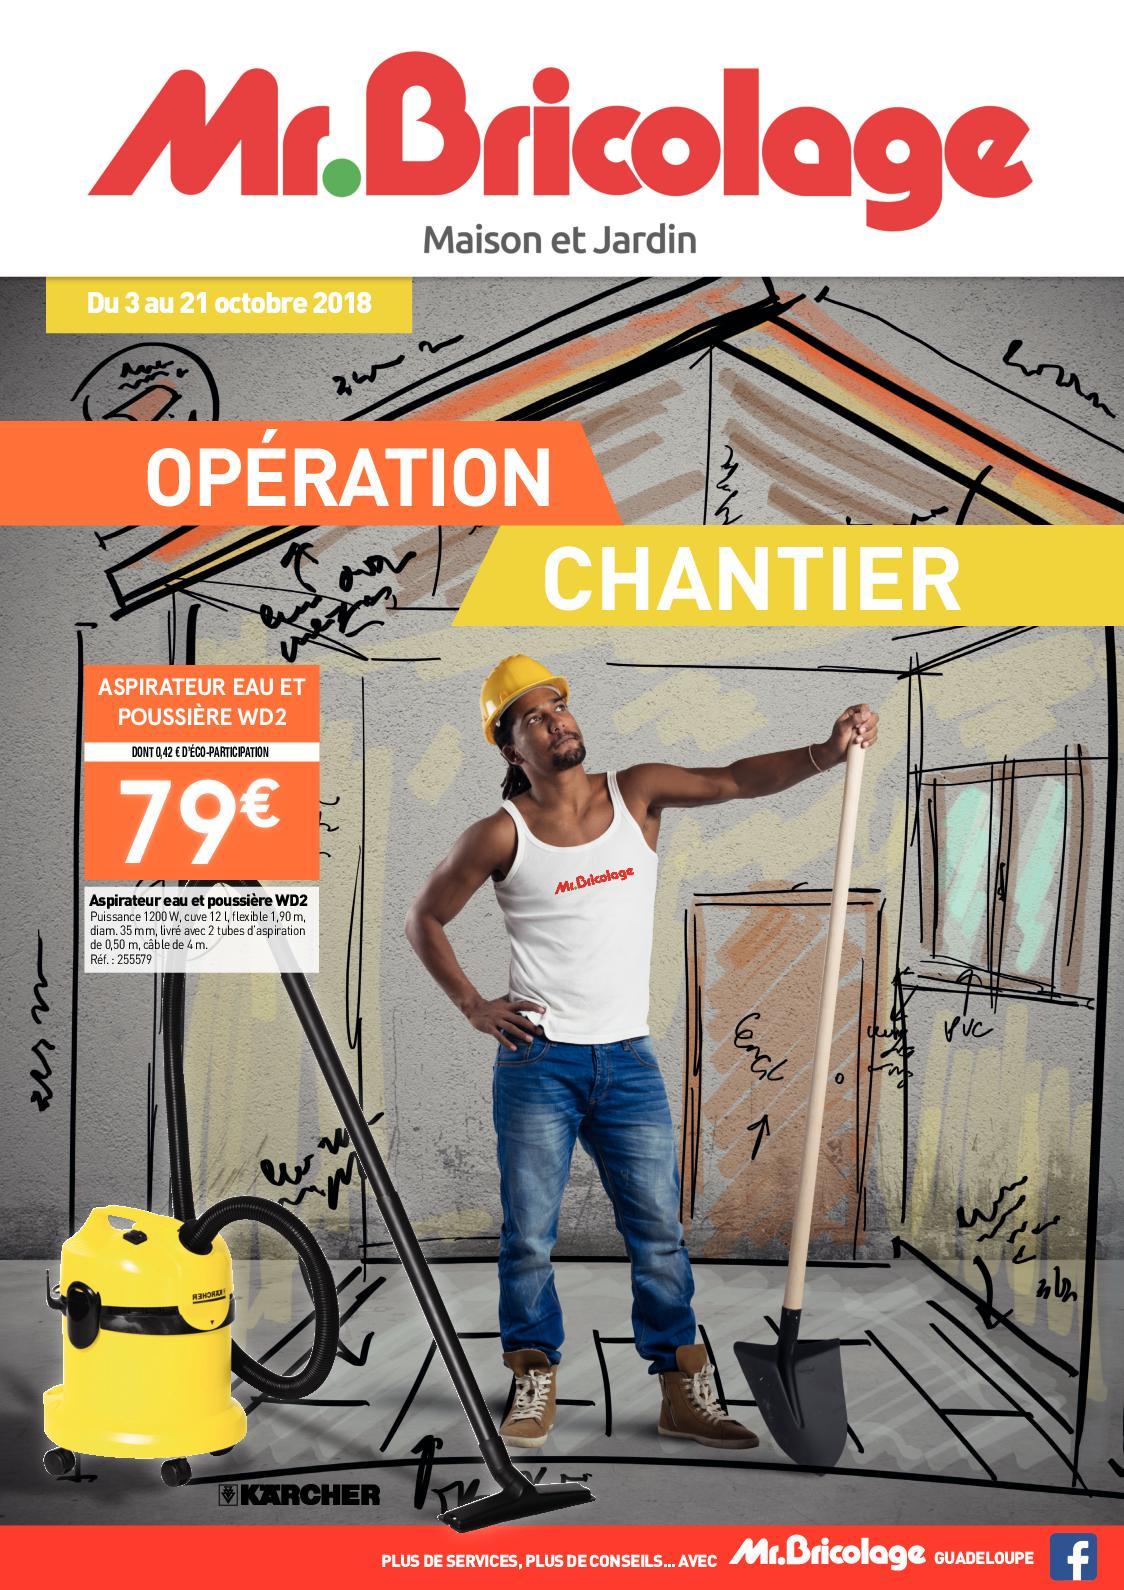 Bricolage Guadeloupe Mr Calaméo Catalogue Chantier UMqzSVp